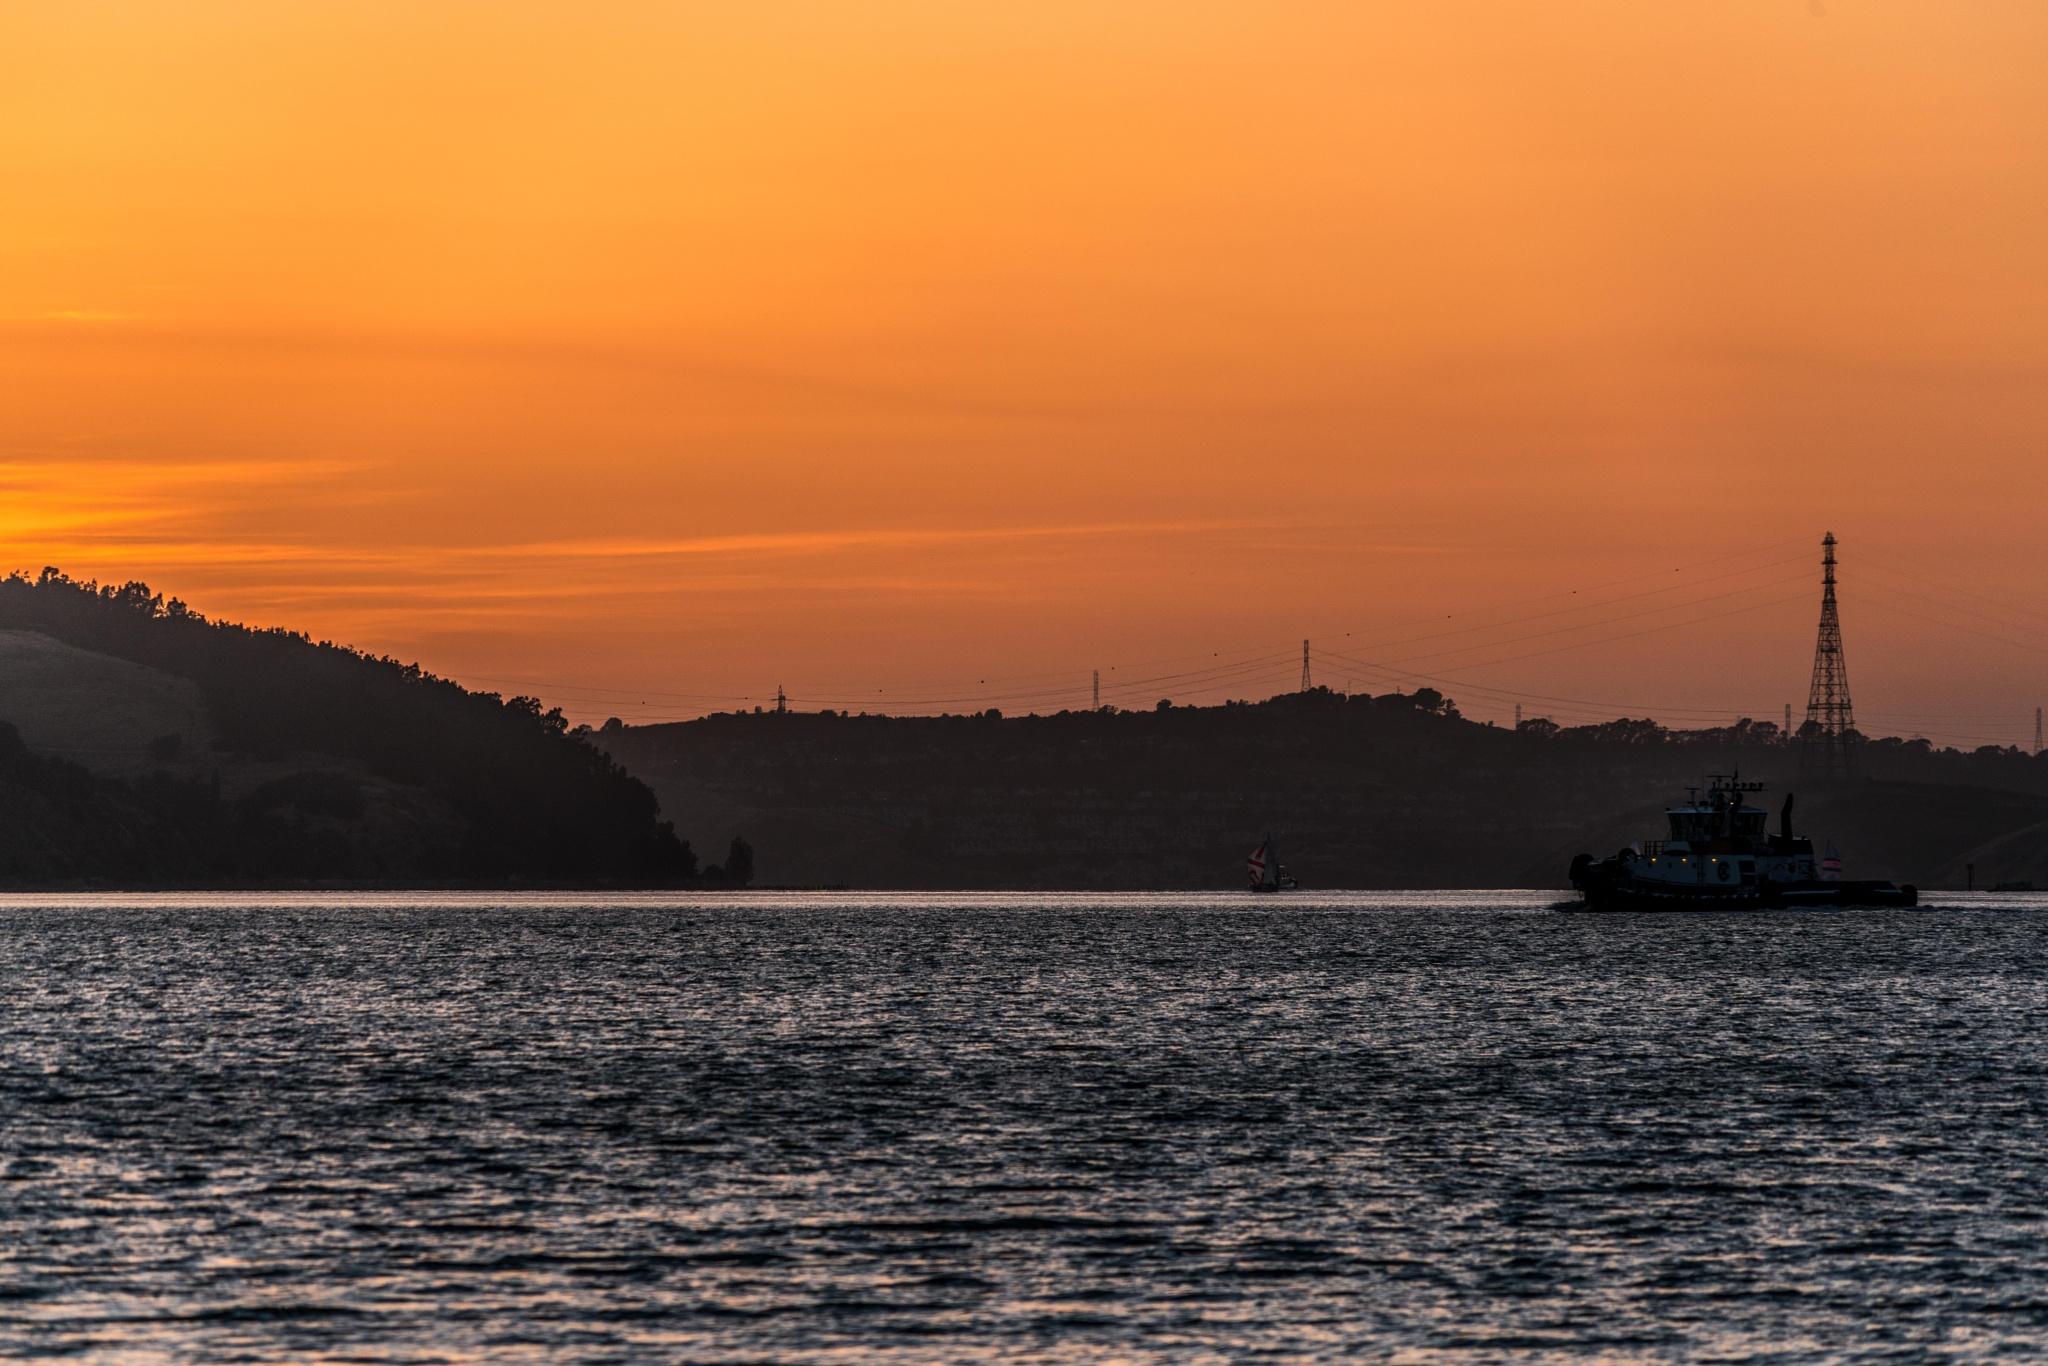 Sunset by Craig Turner